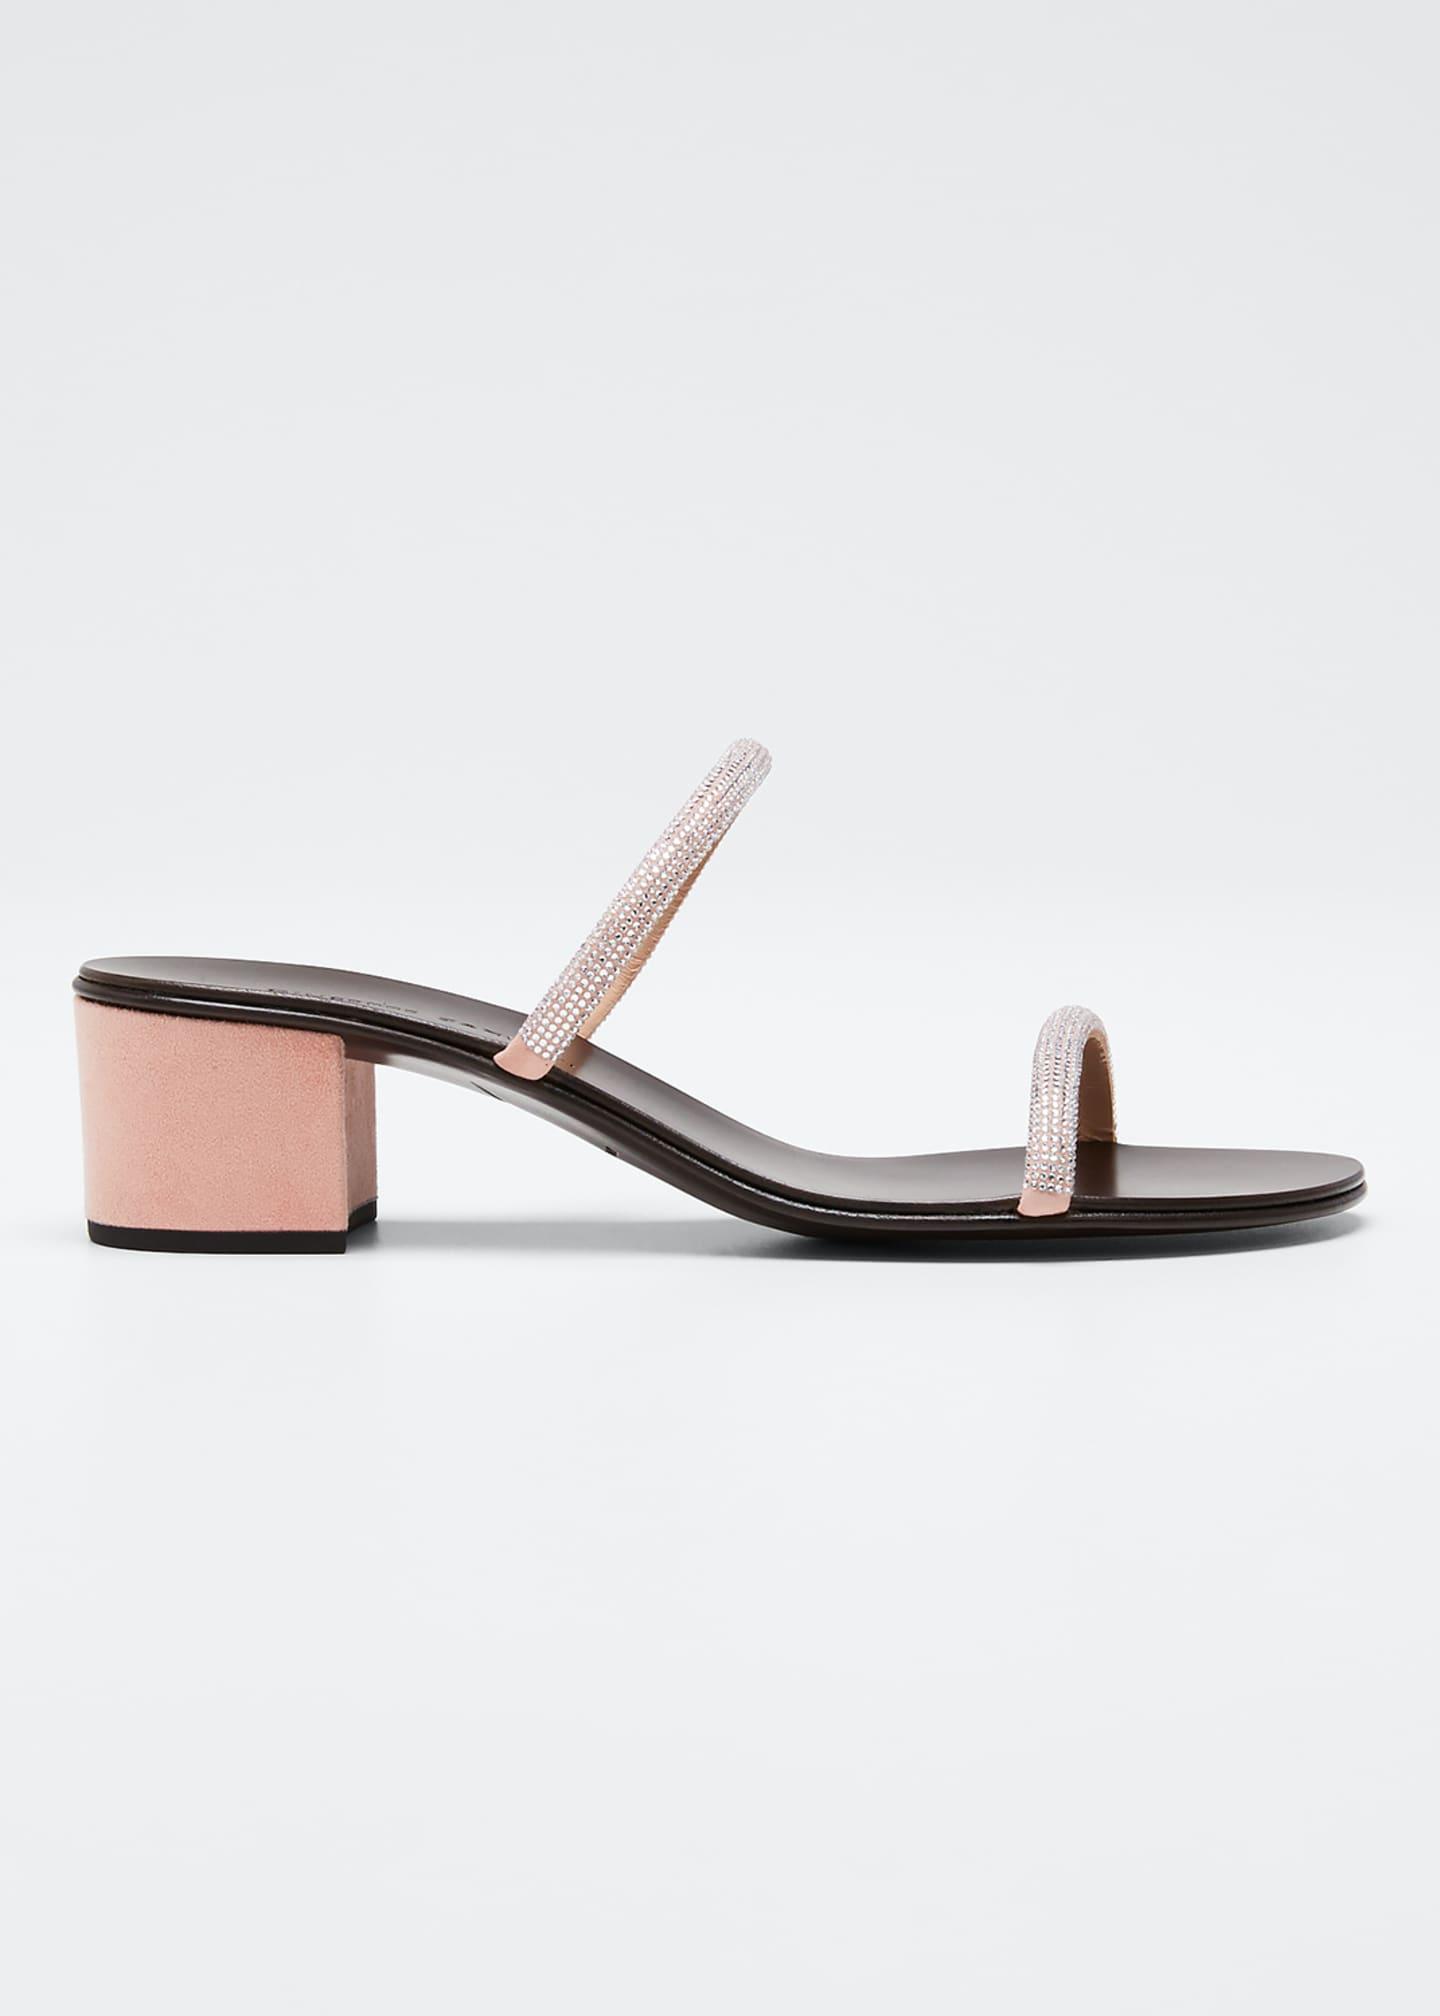 Giuseppe Zanotti Suede & Crystal Slide Sandals